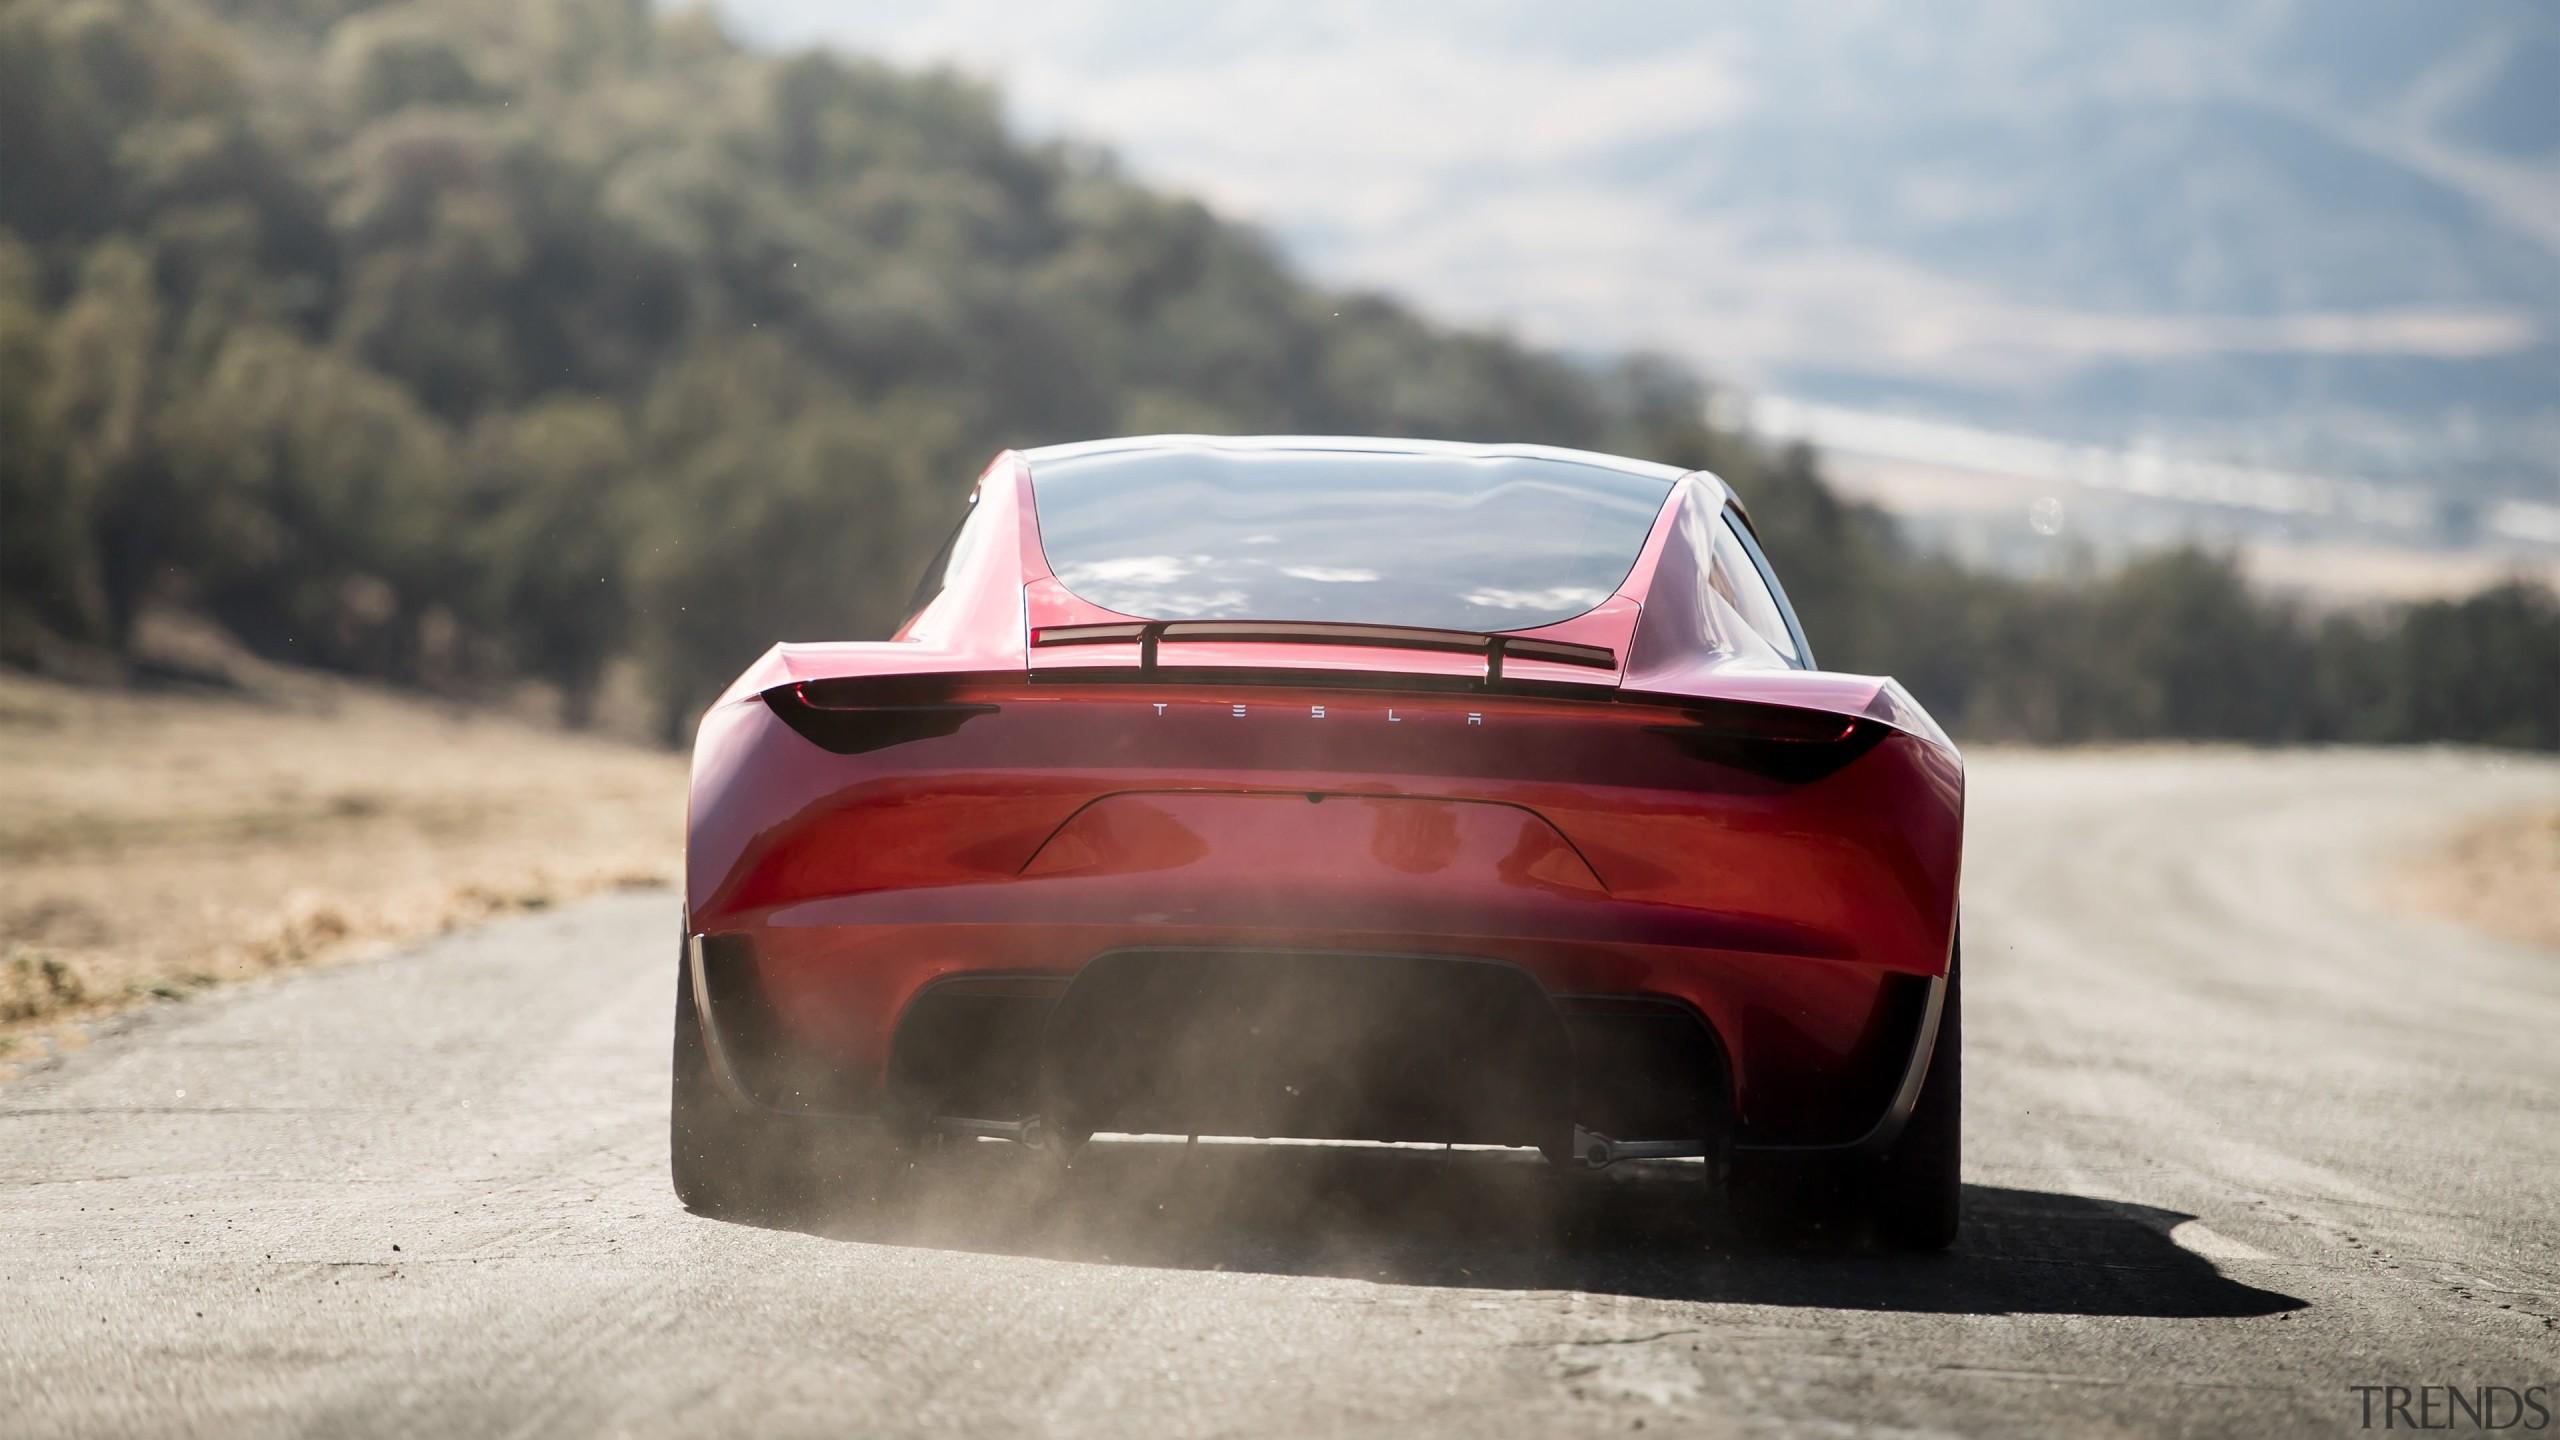 Tesla's new Roadster - Tesla's new Roadster - automotive design, automotive exterior, car, concept car, luxury vehicle, performance car, personal luxury car, race car, sports car, supercar, vehicle, gray